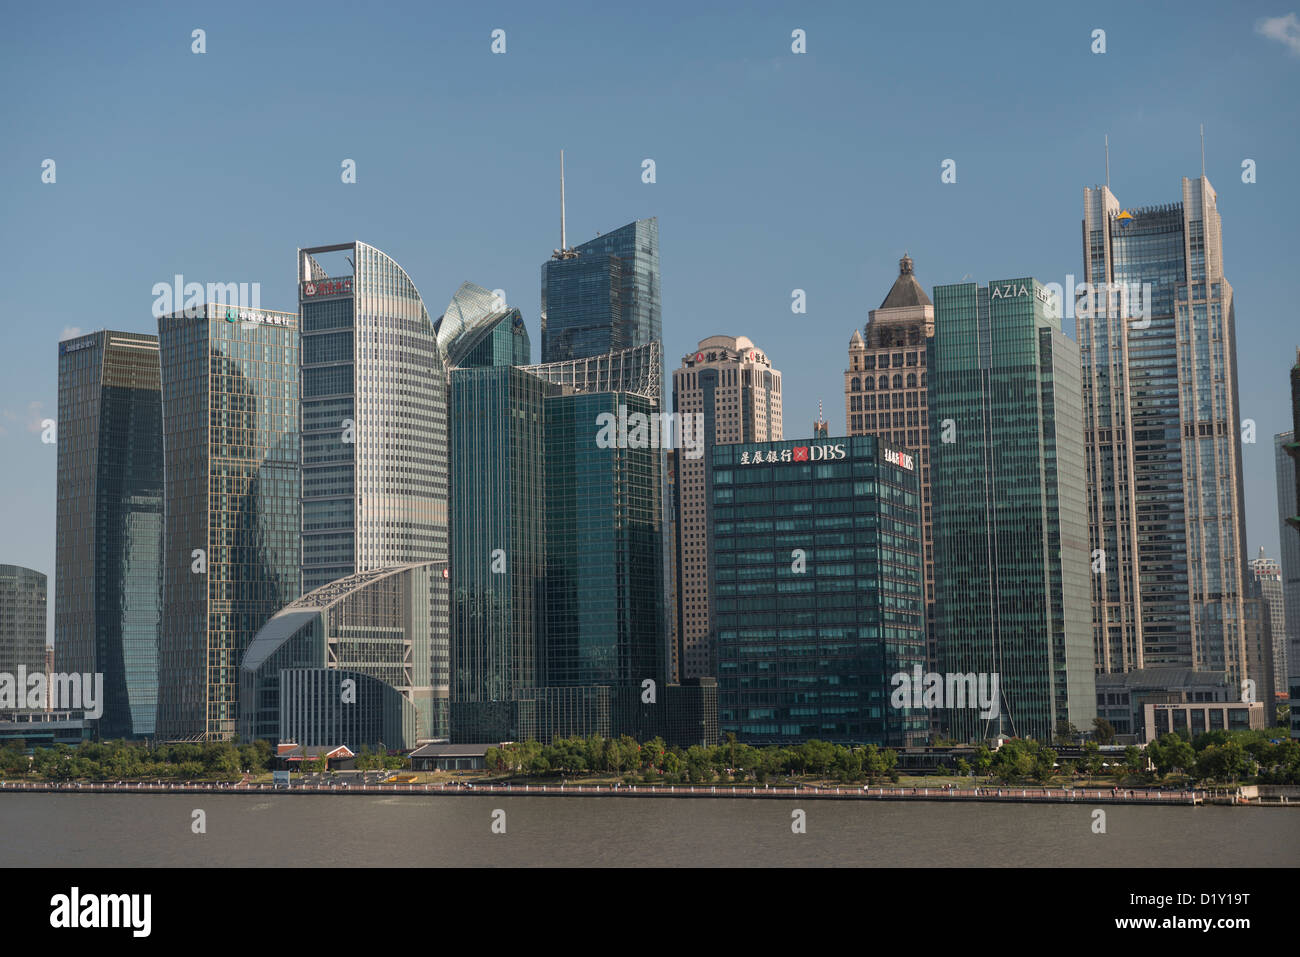 Pu Jiang Shuanghui Buildings and China Merchants Bank Mansion on the banks of the Huangpu River, Lujiazui, Pudong, - Stock Image